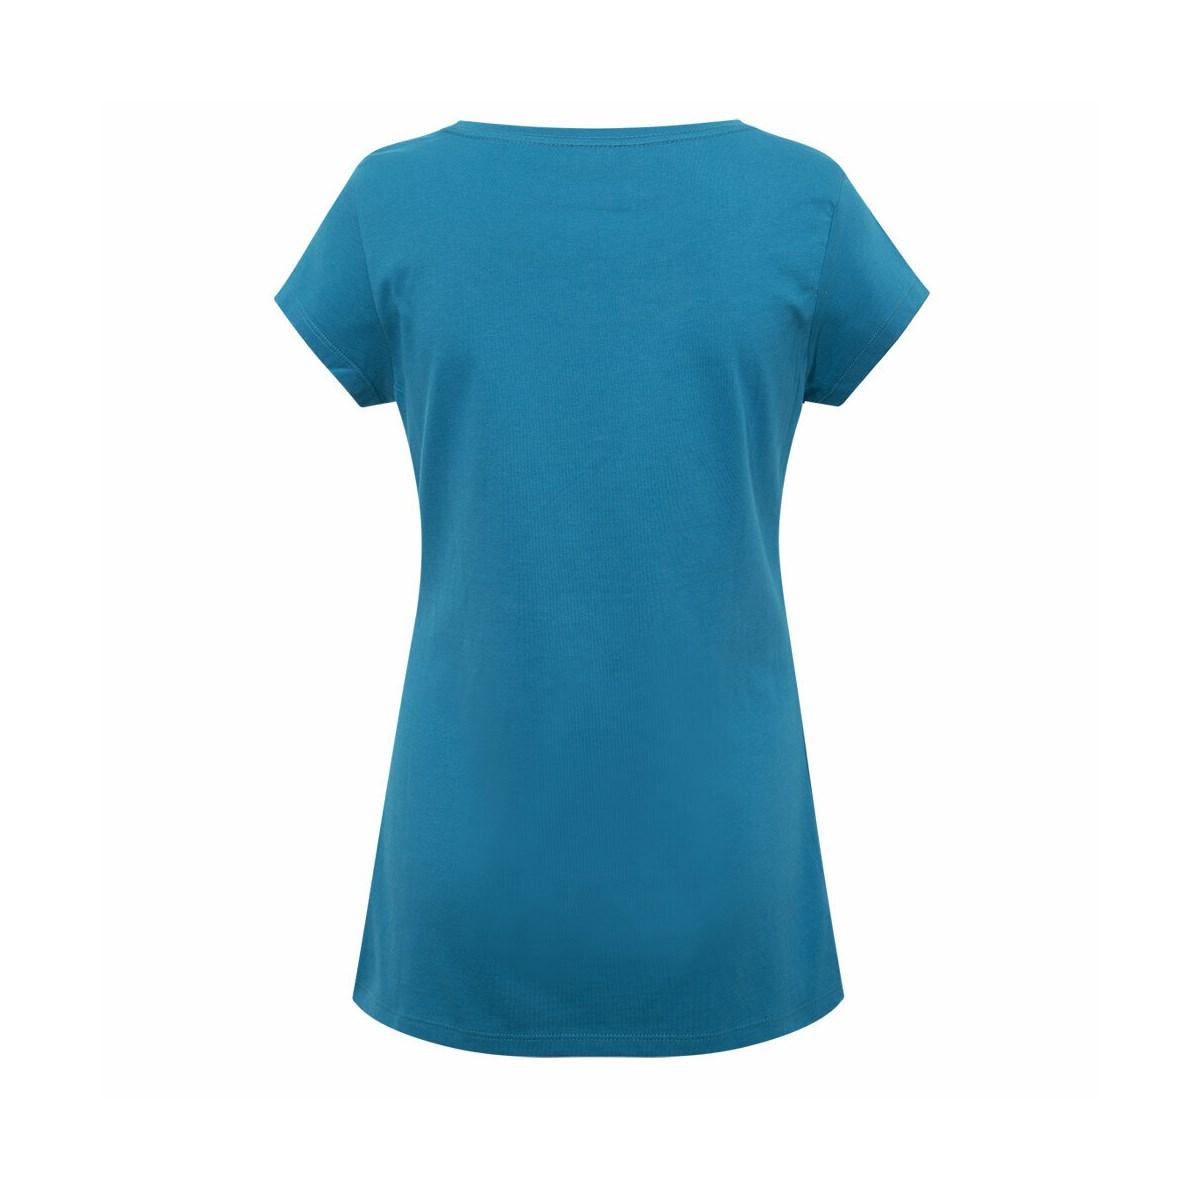 Csc W Brand Retro Kadın Mavi Tişört